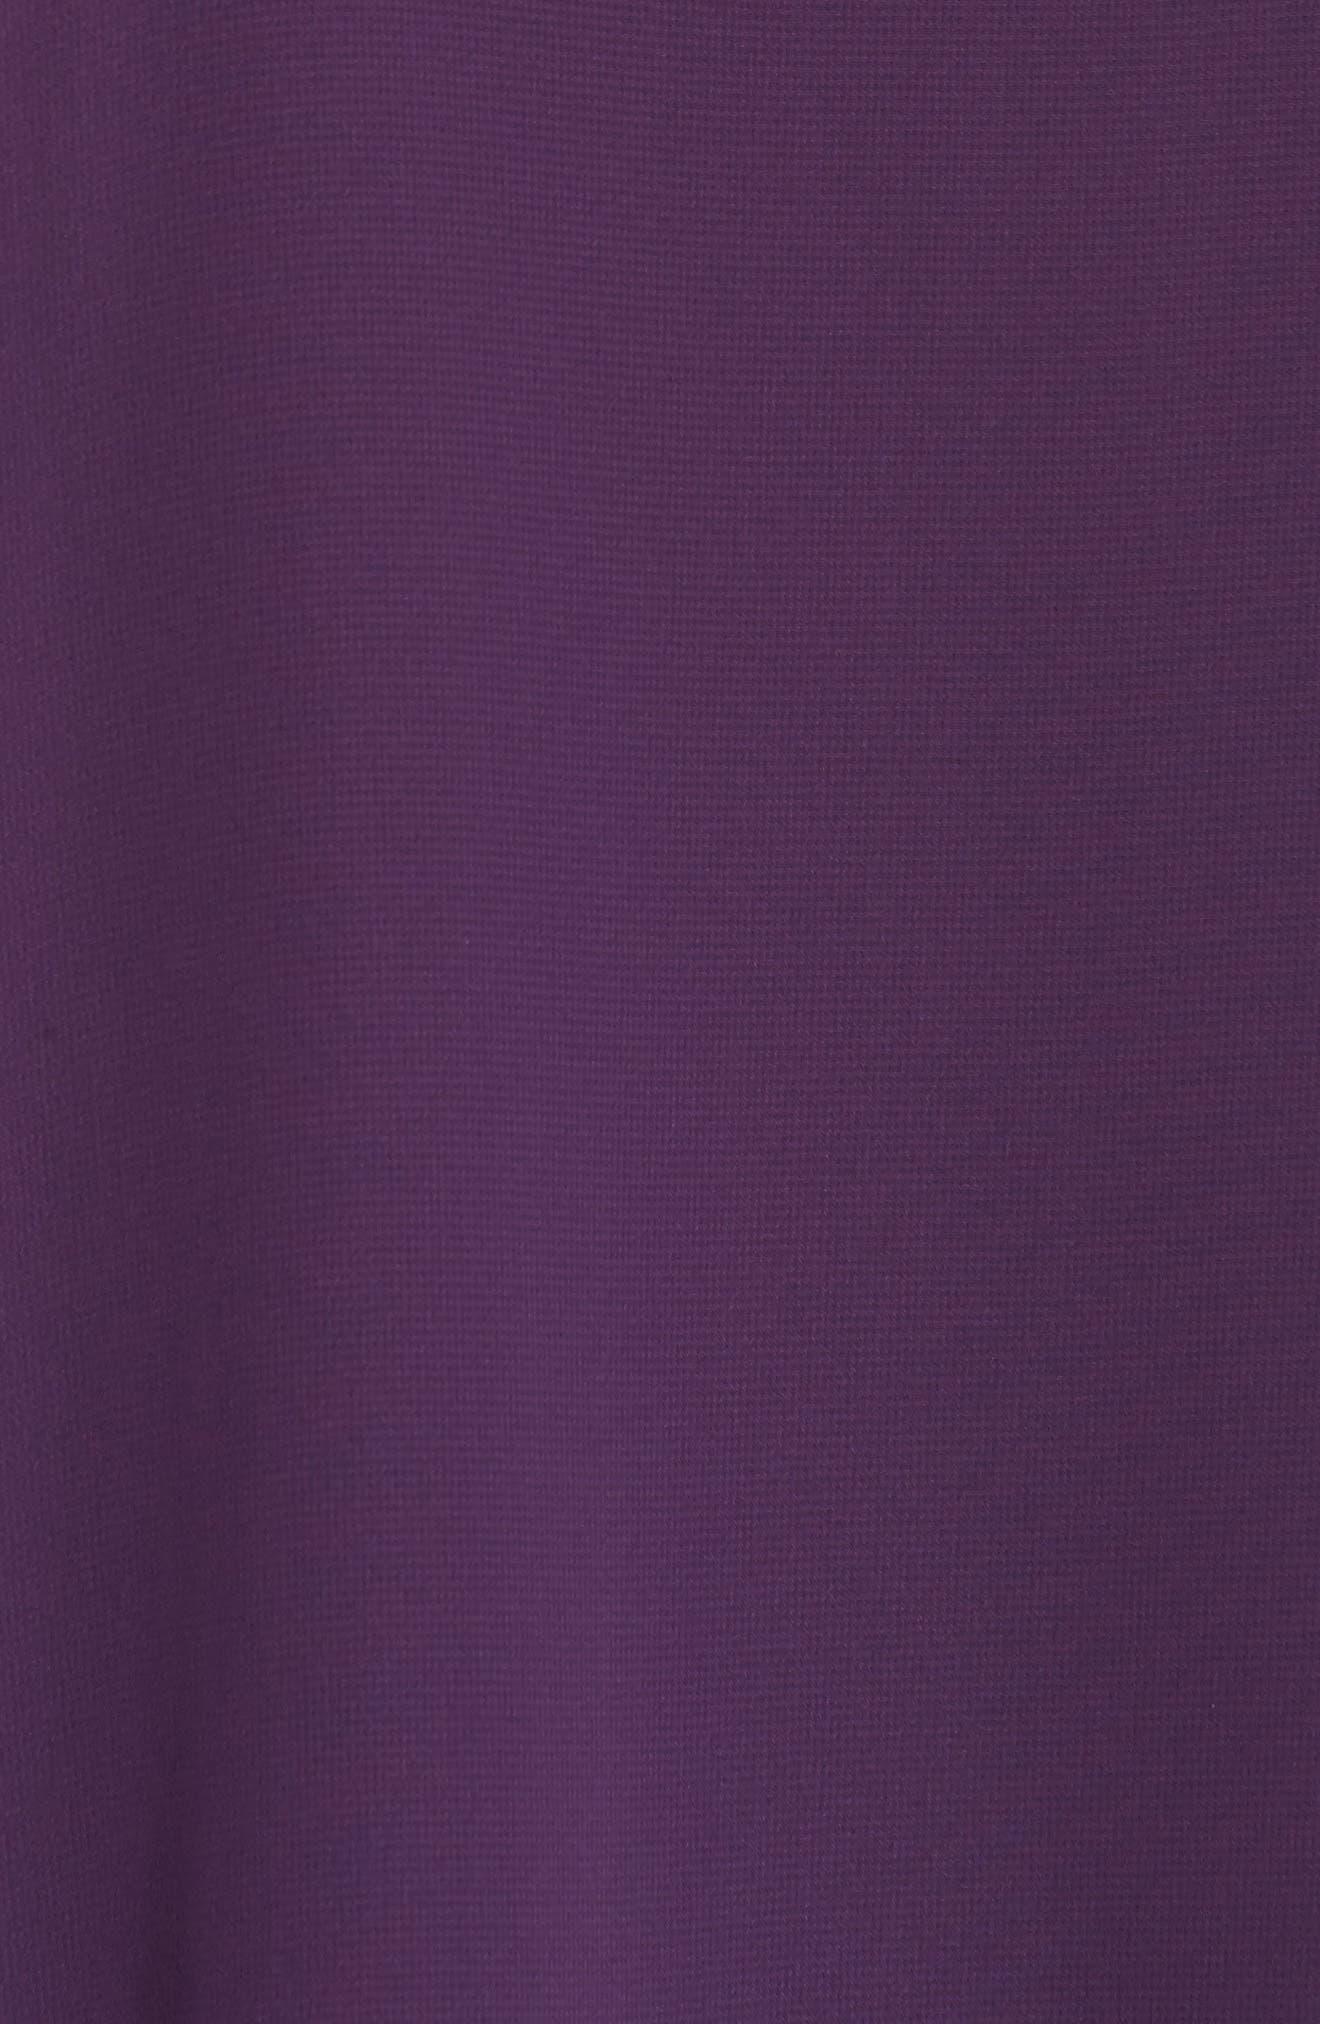 Chiffon Overlay Shift Dress,                             Alternate thumbnail 5, color,                             515